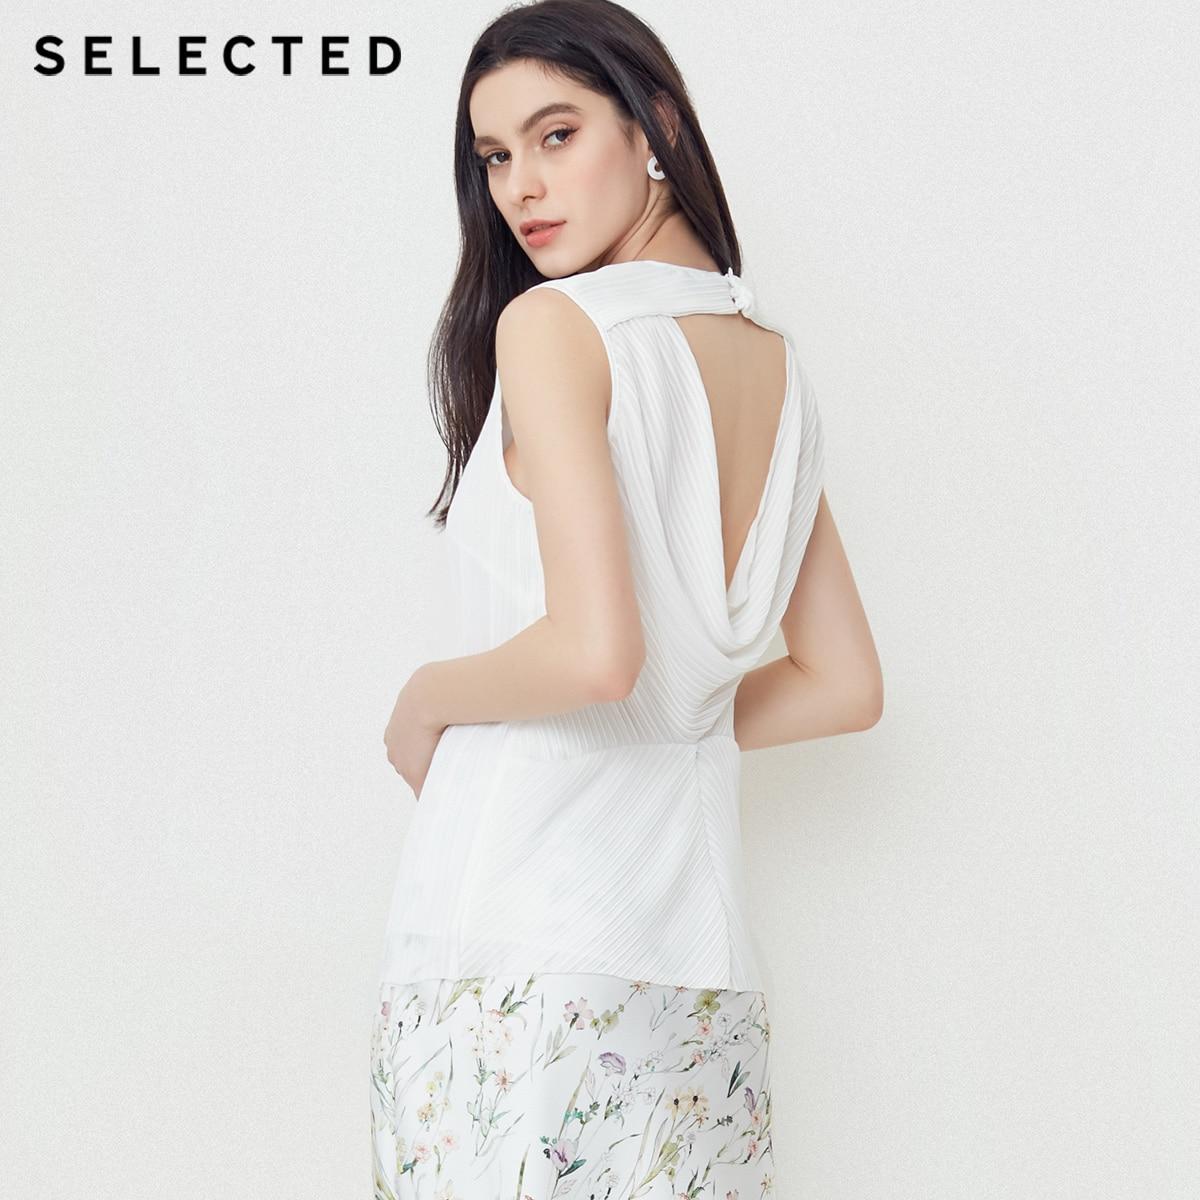 SELECTED Women s Summer Folded Sleeveless Tops S 4182W3510